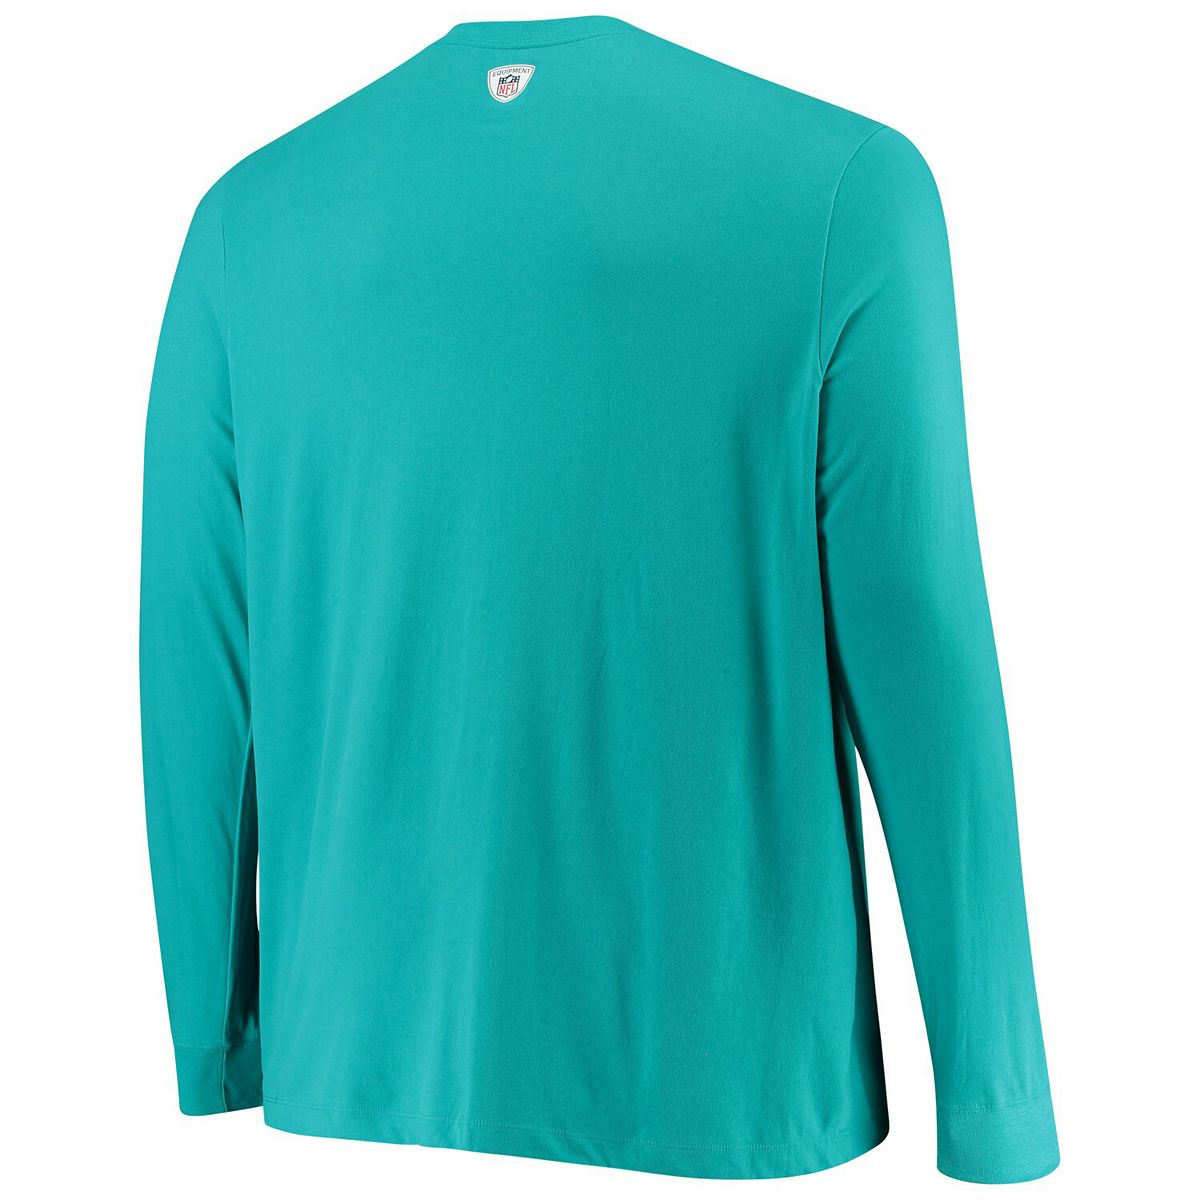 Miami Dolphins Nike Sideline Property Of Performance Long Sleeve T-Shirt - Aqua oNilK